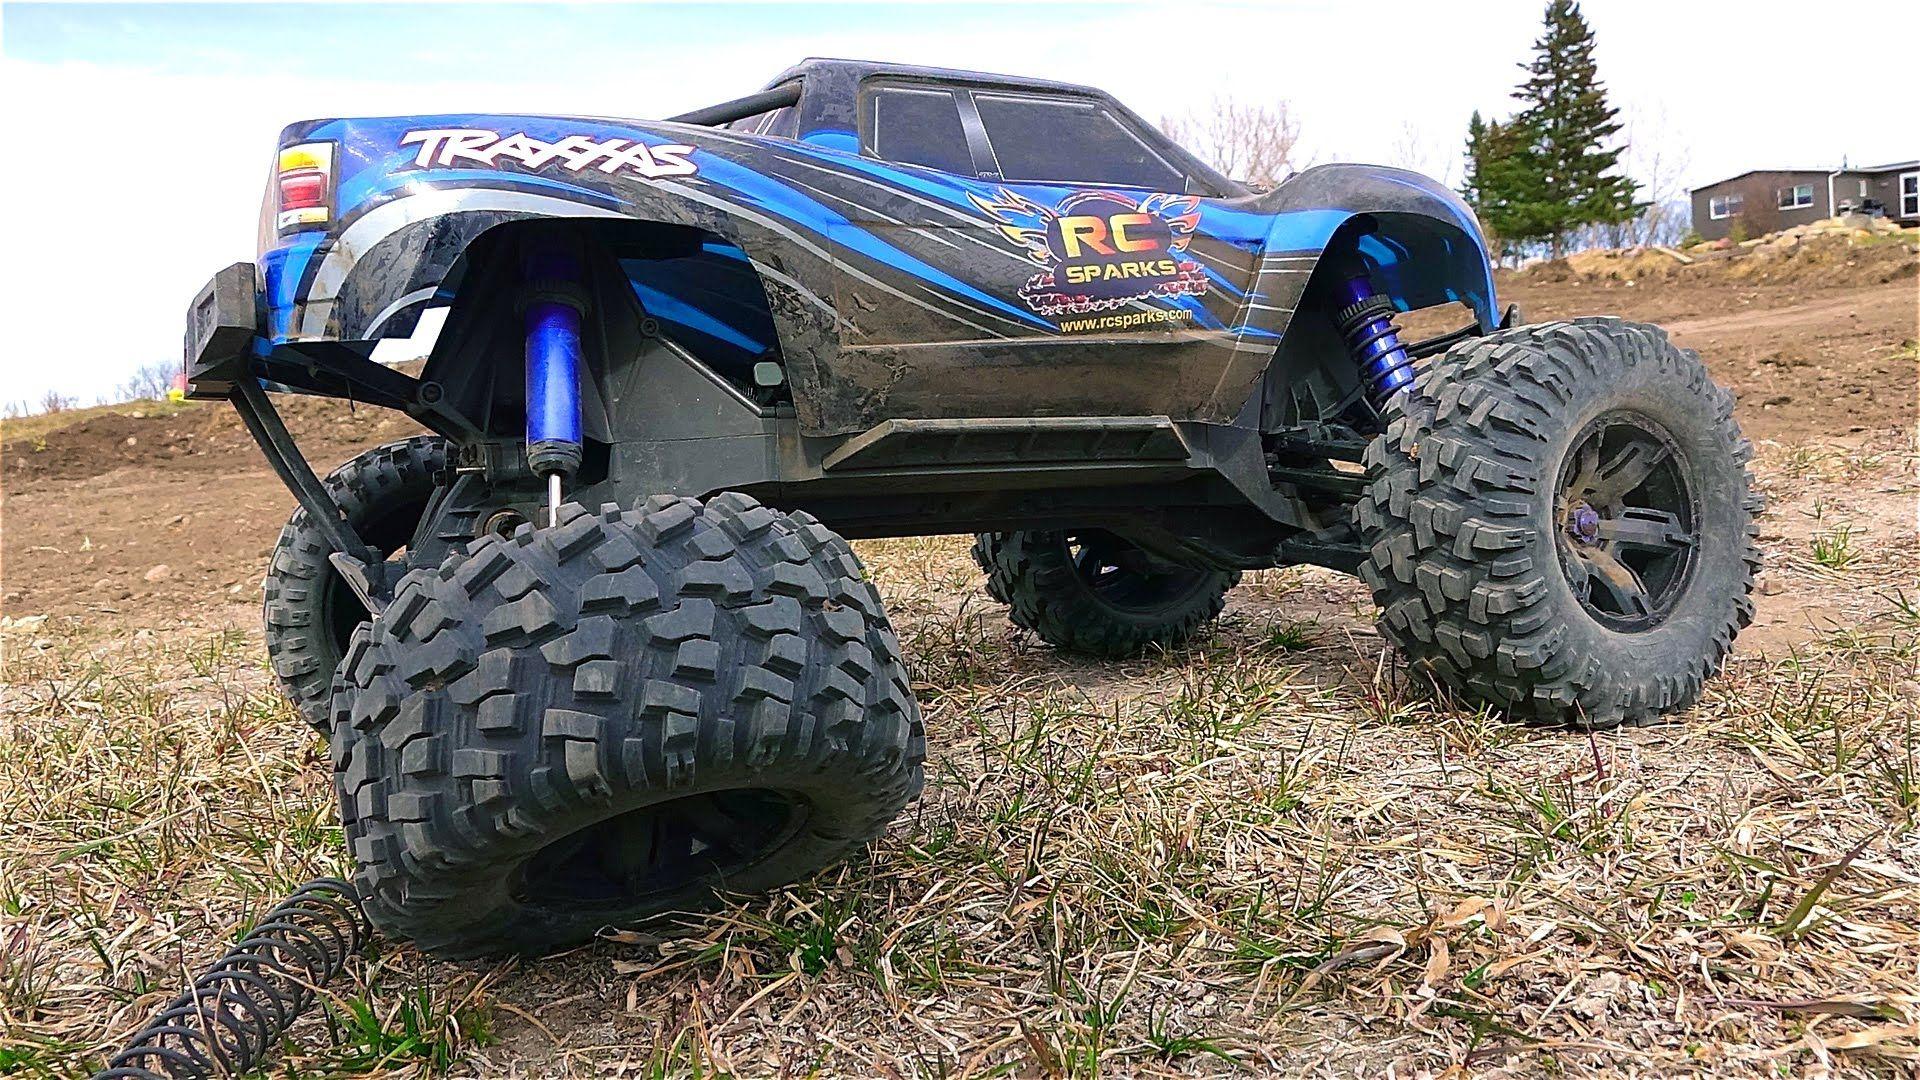 T bone racing chassis brace wheelie bar set for traxxas 1 16 mini e revo cars